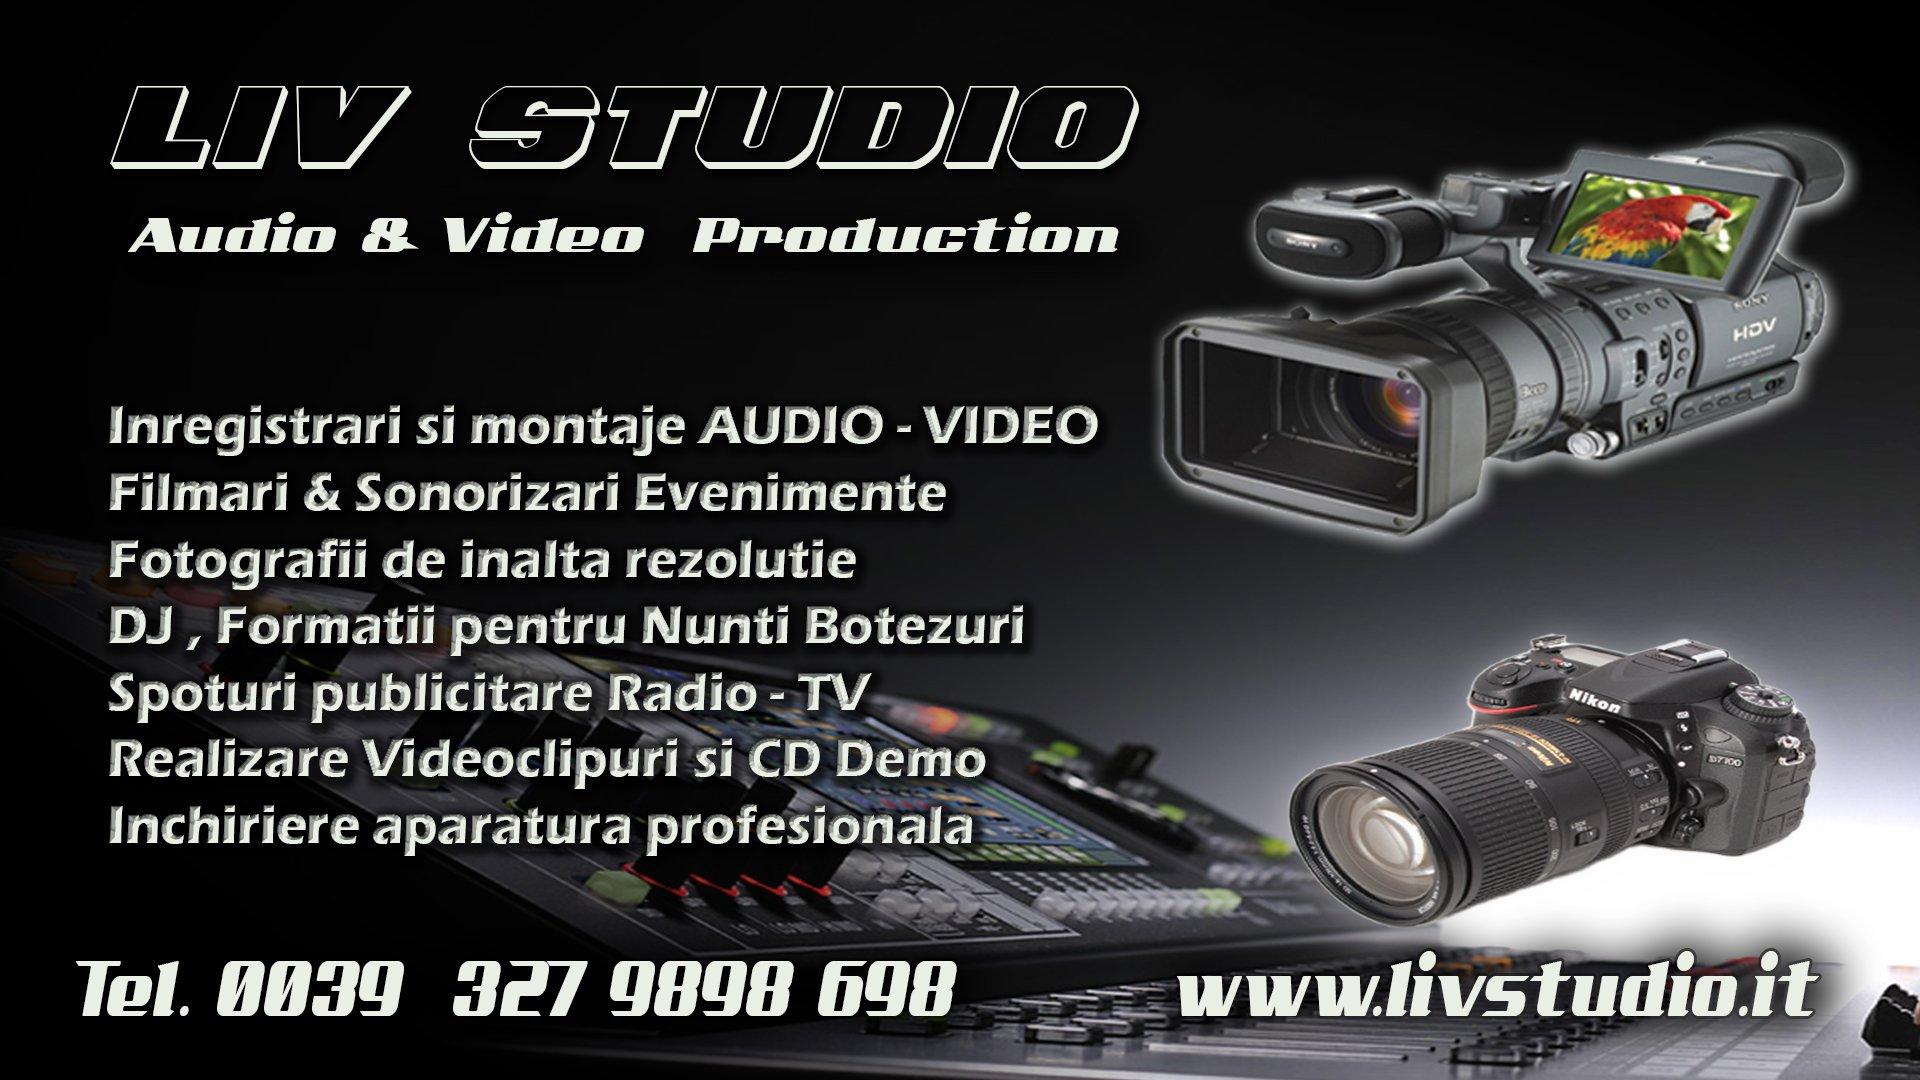 Liv Studio Torino Audio Video Production